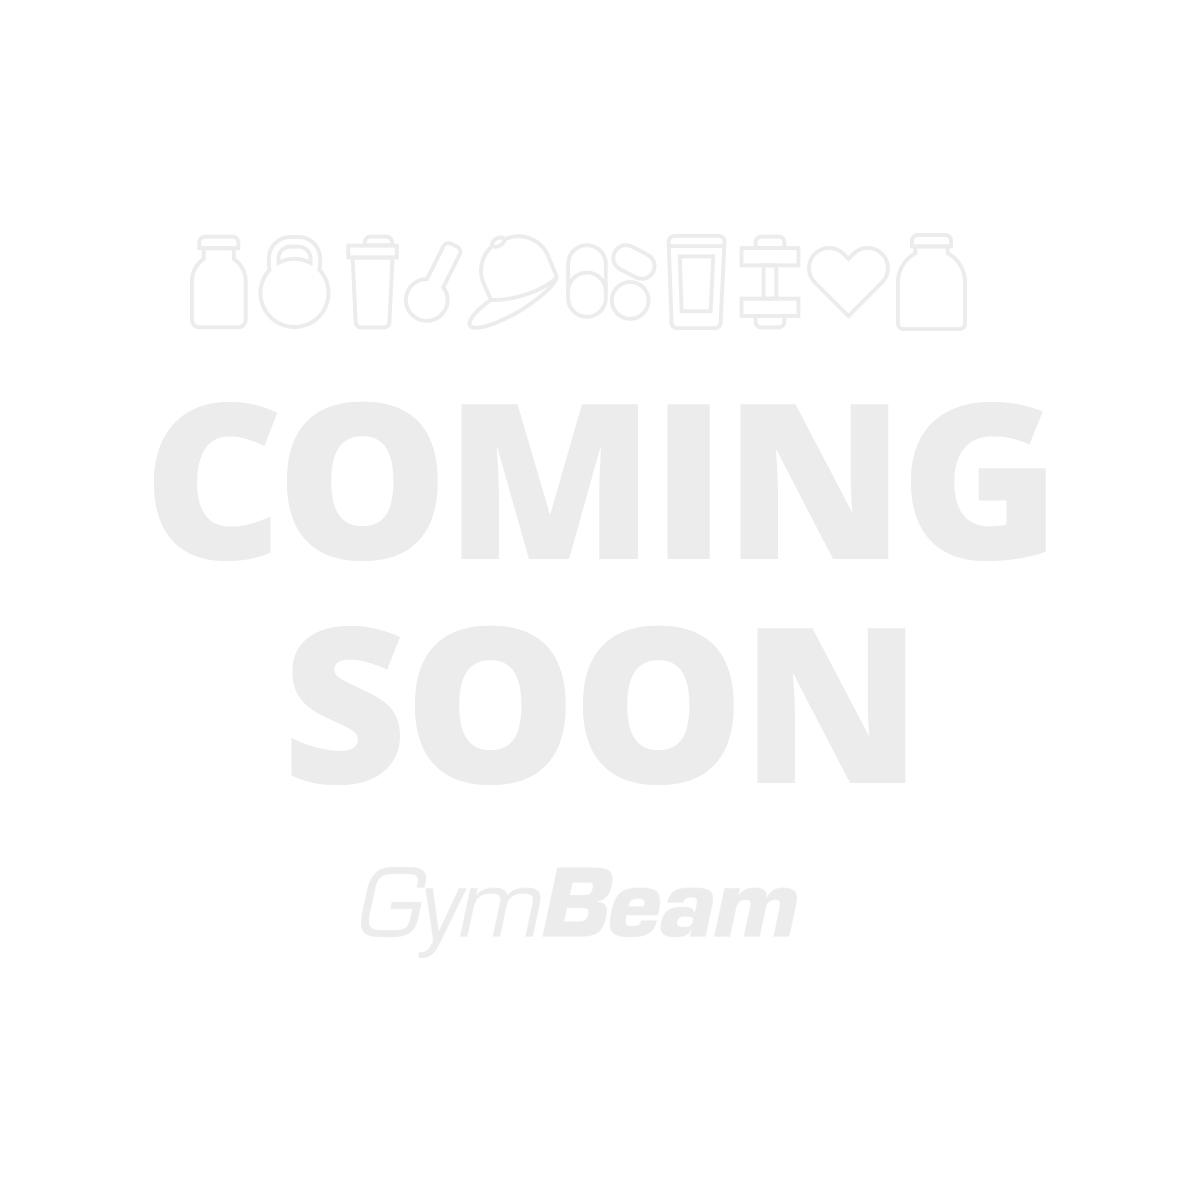 thermopro fat burner)